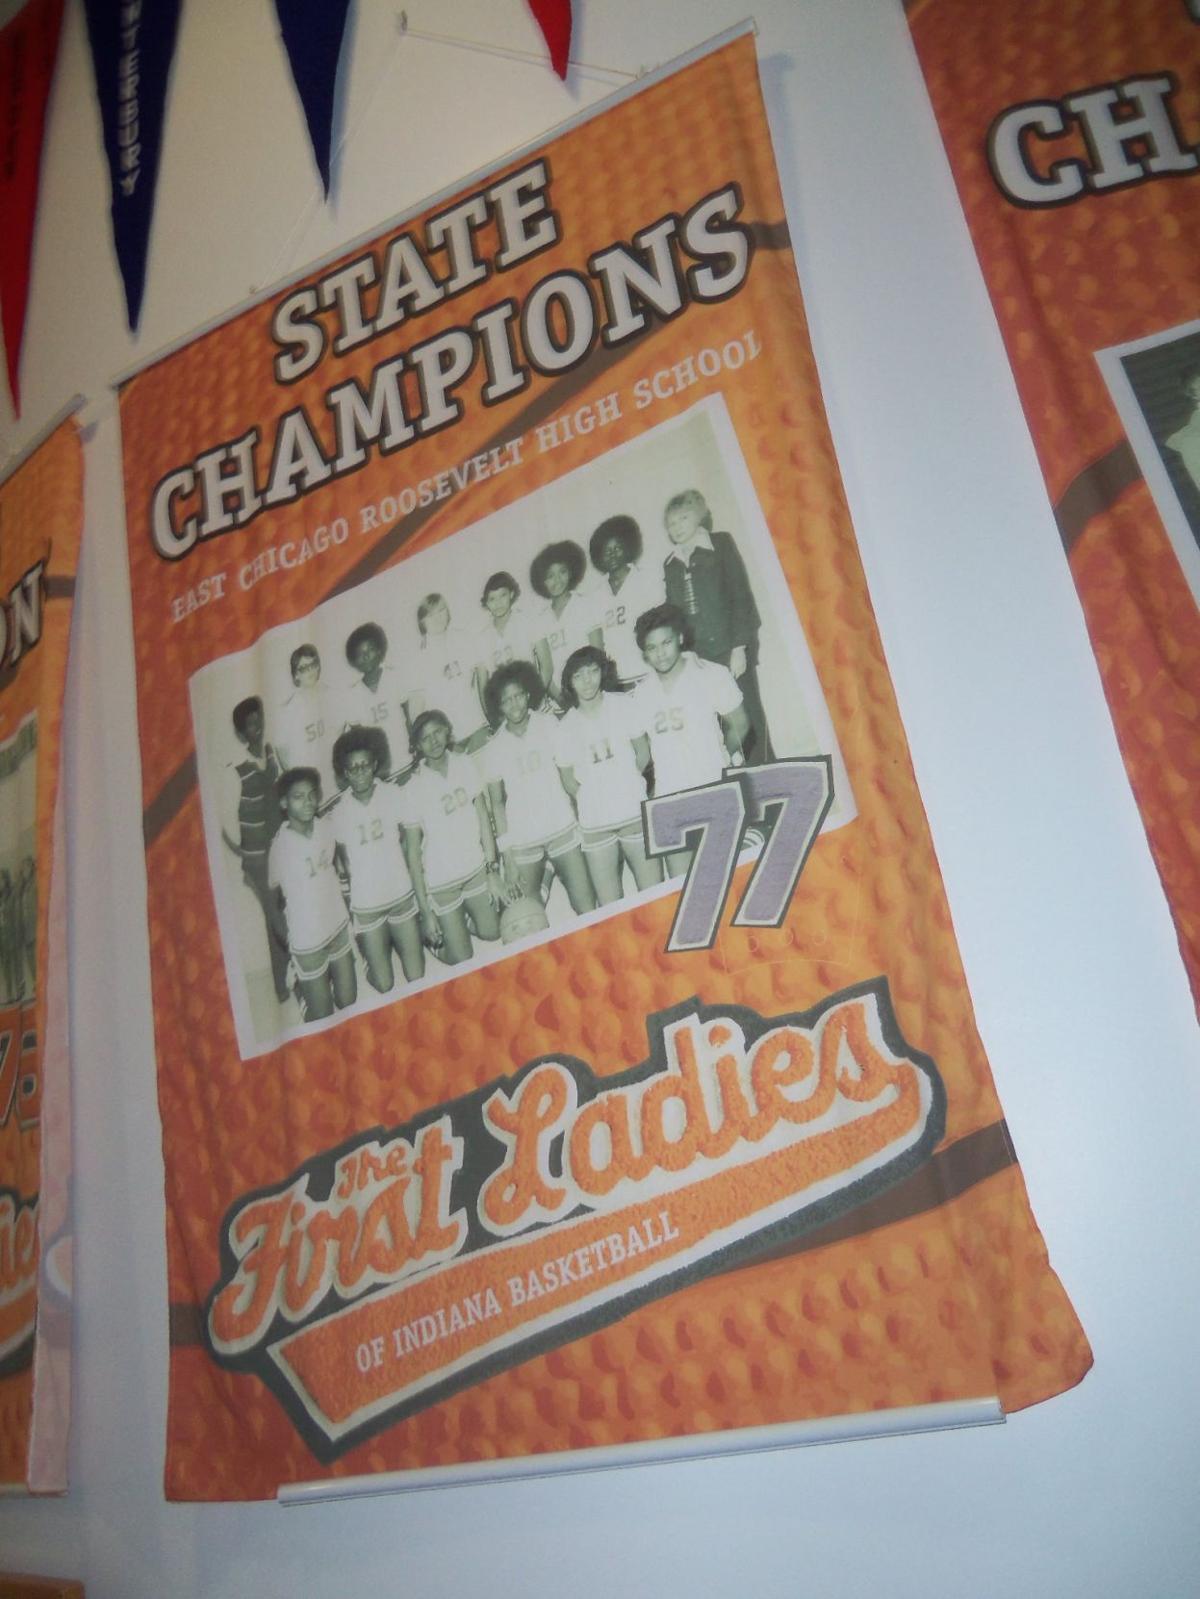 Good time at basketball shrine a slam dunk